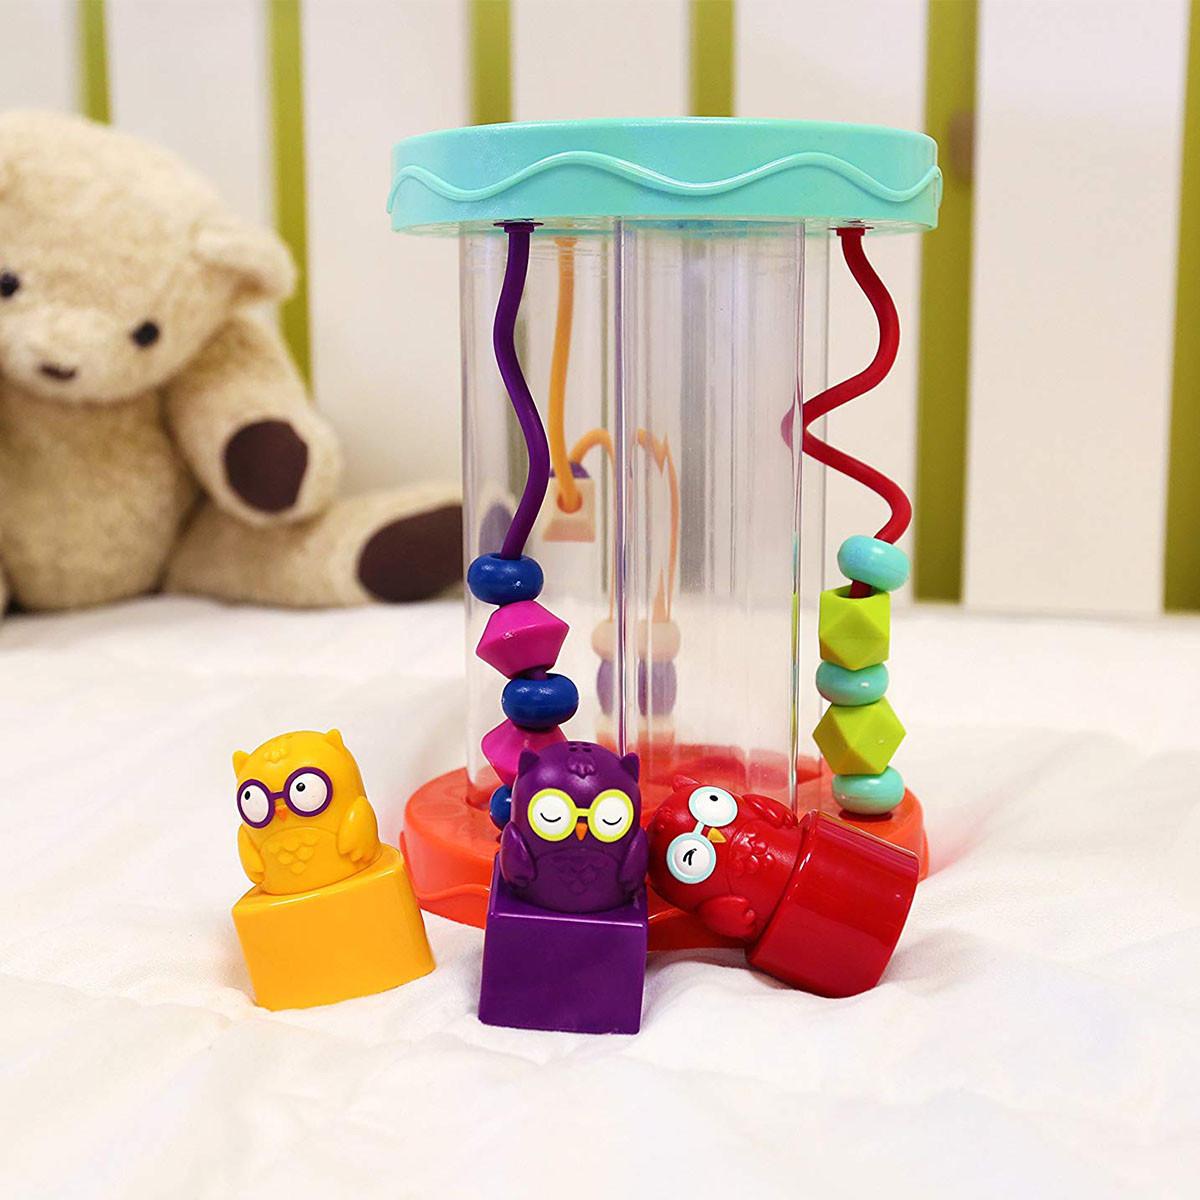 B toys aktivna igračka Sova